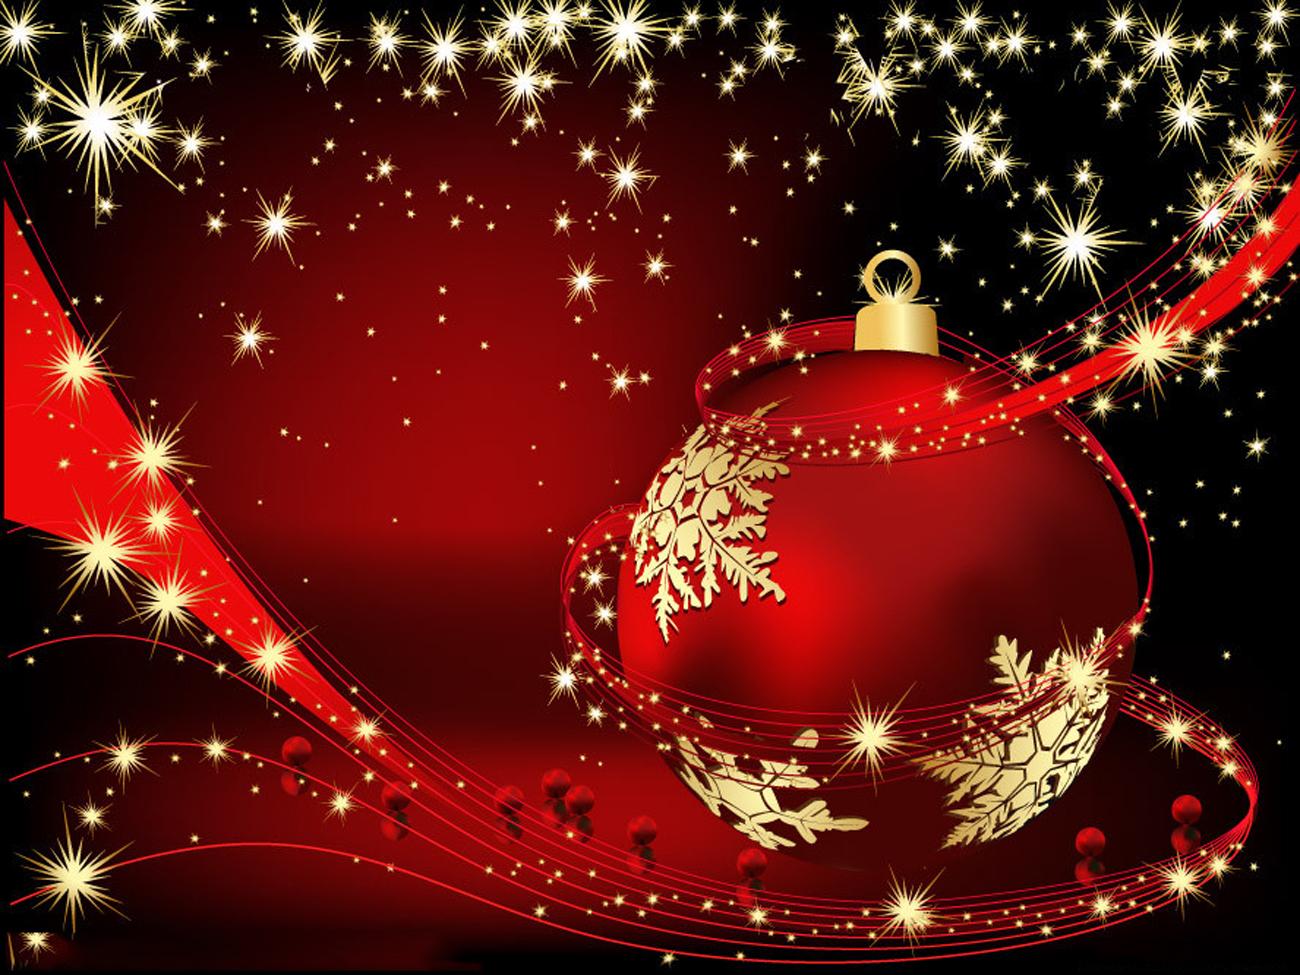 Christmas Holidays 10 Desktop Wallpaper   Hivewallpapercom 1300x975